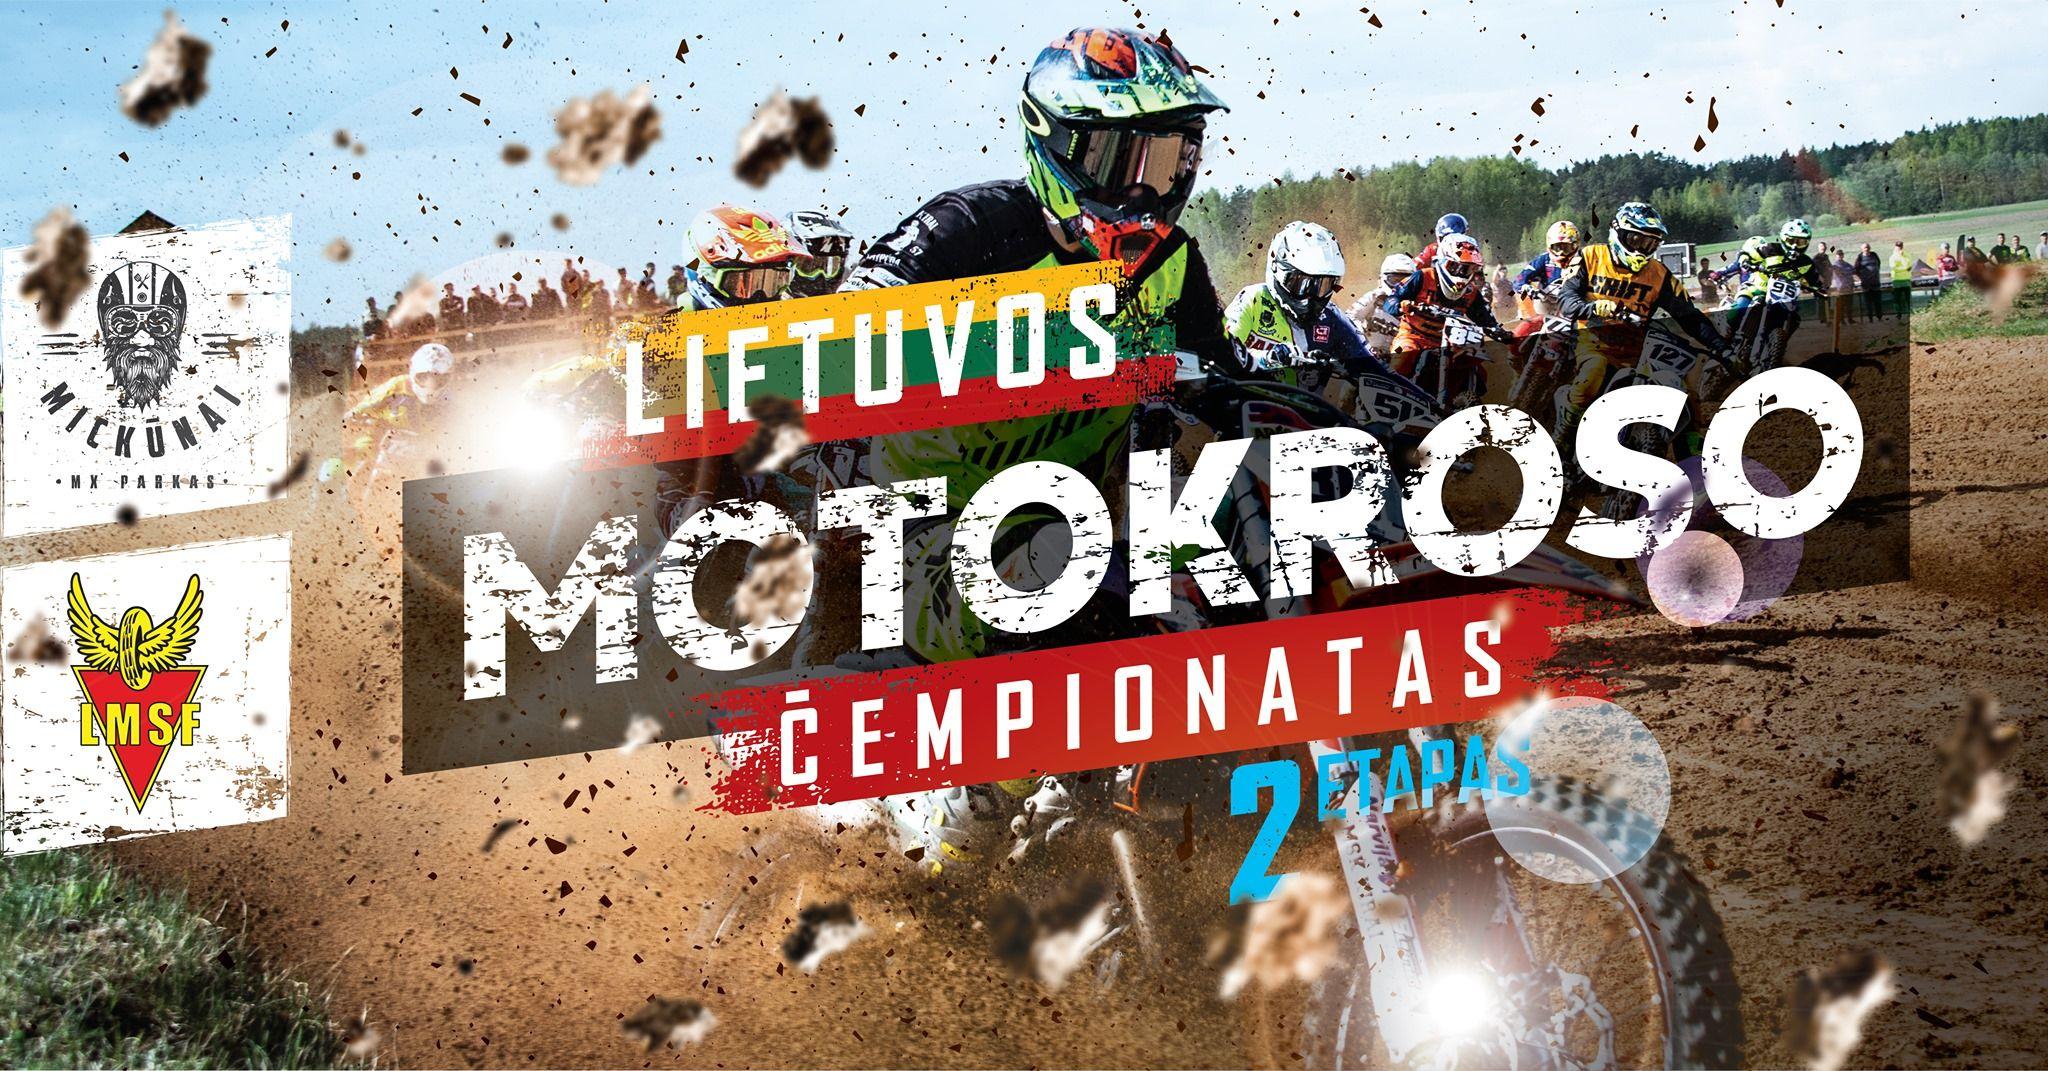 Lietuvos motokroso čempionatas 2019 (2 etapas) / Antra diena